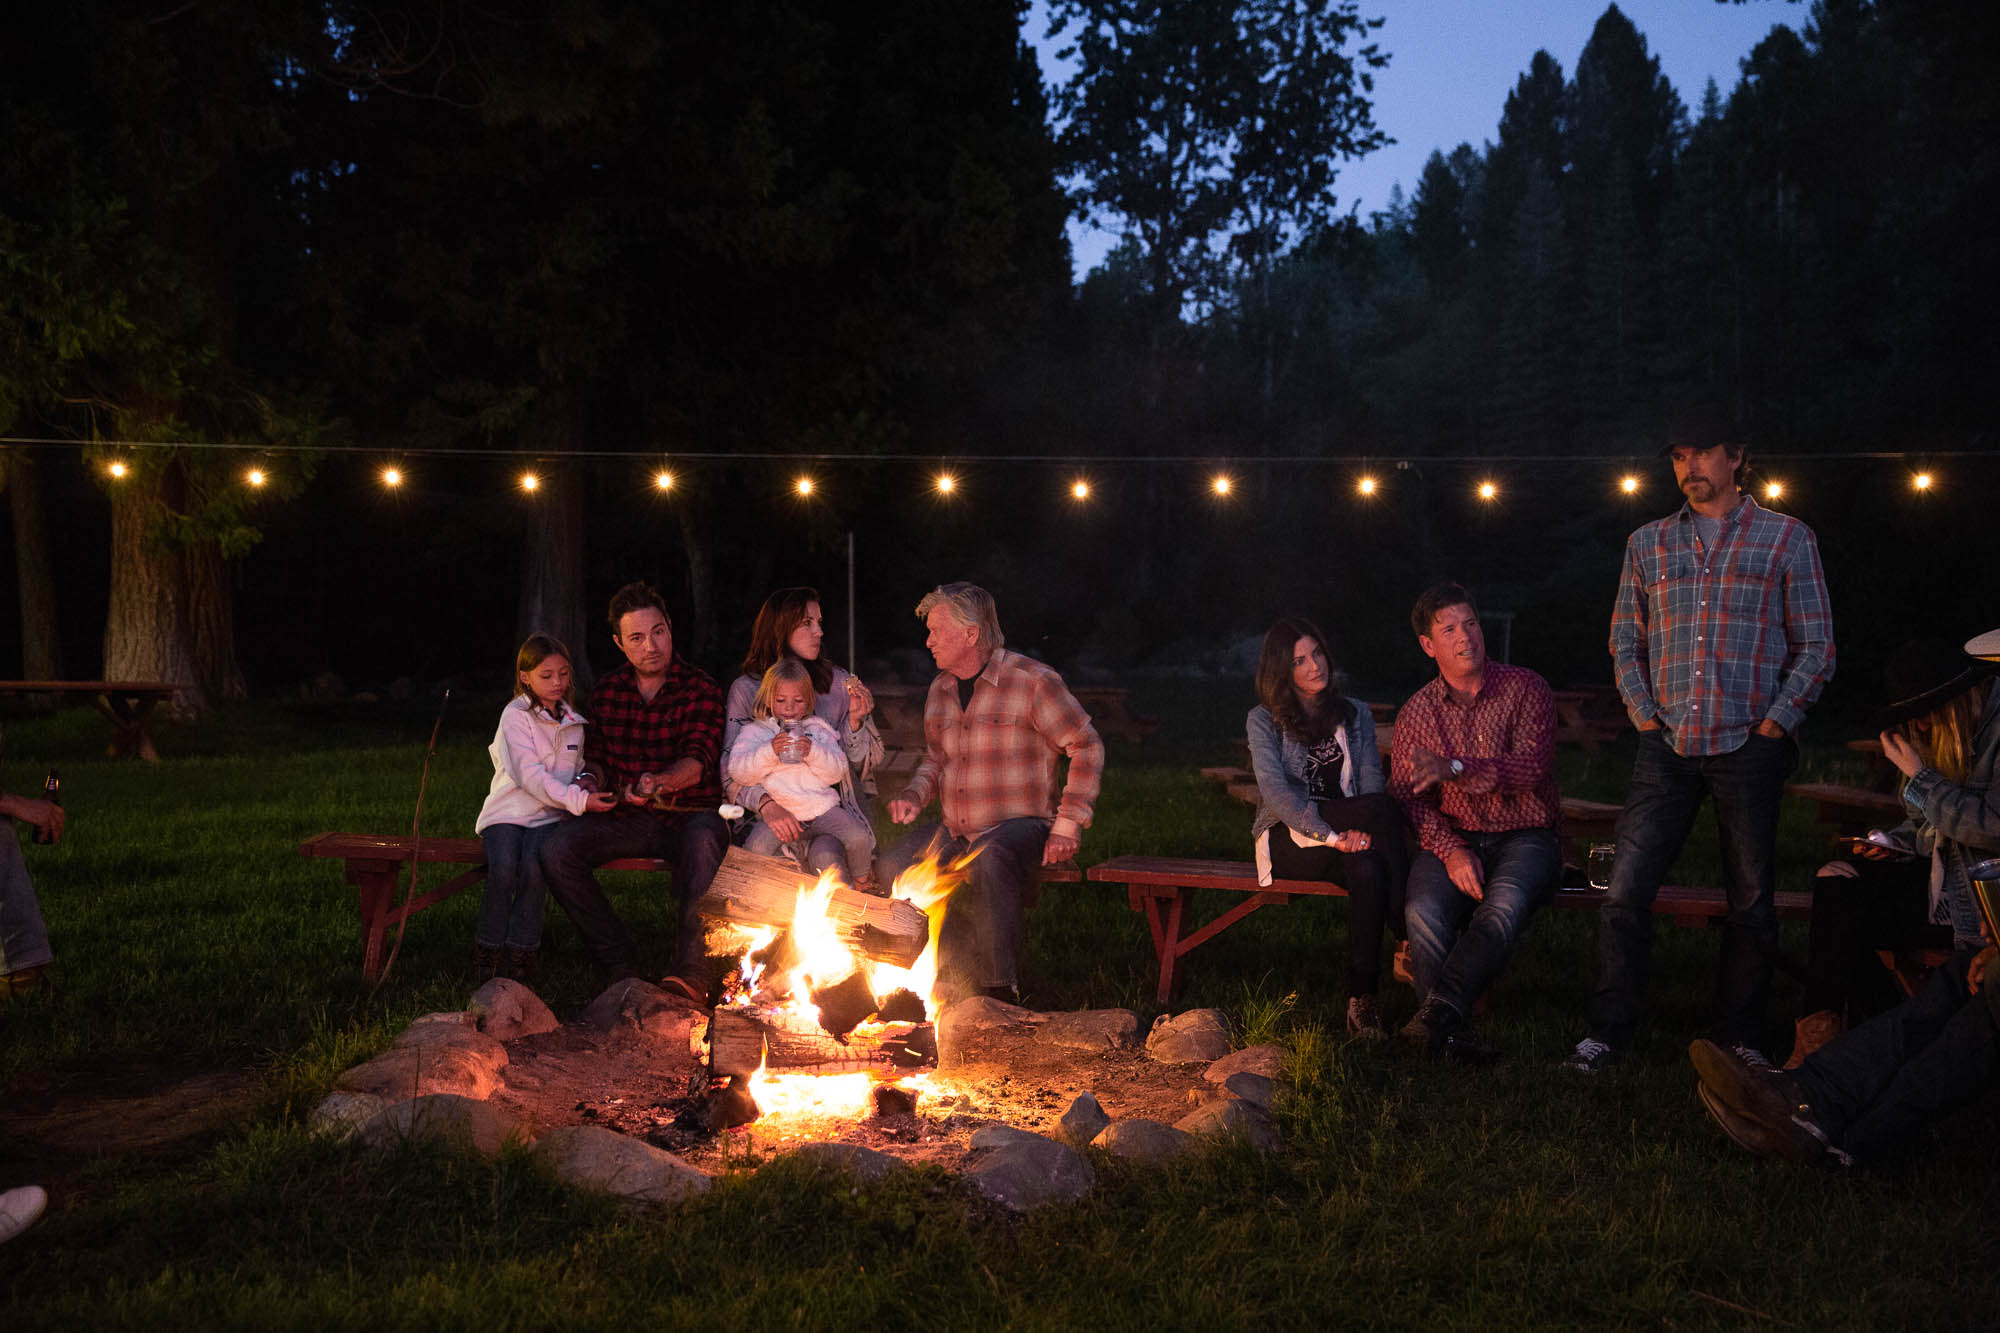 Family bonding vacation around the campfire